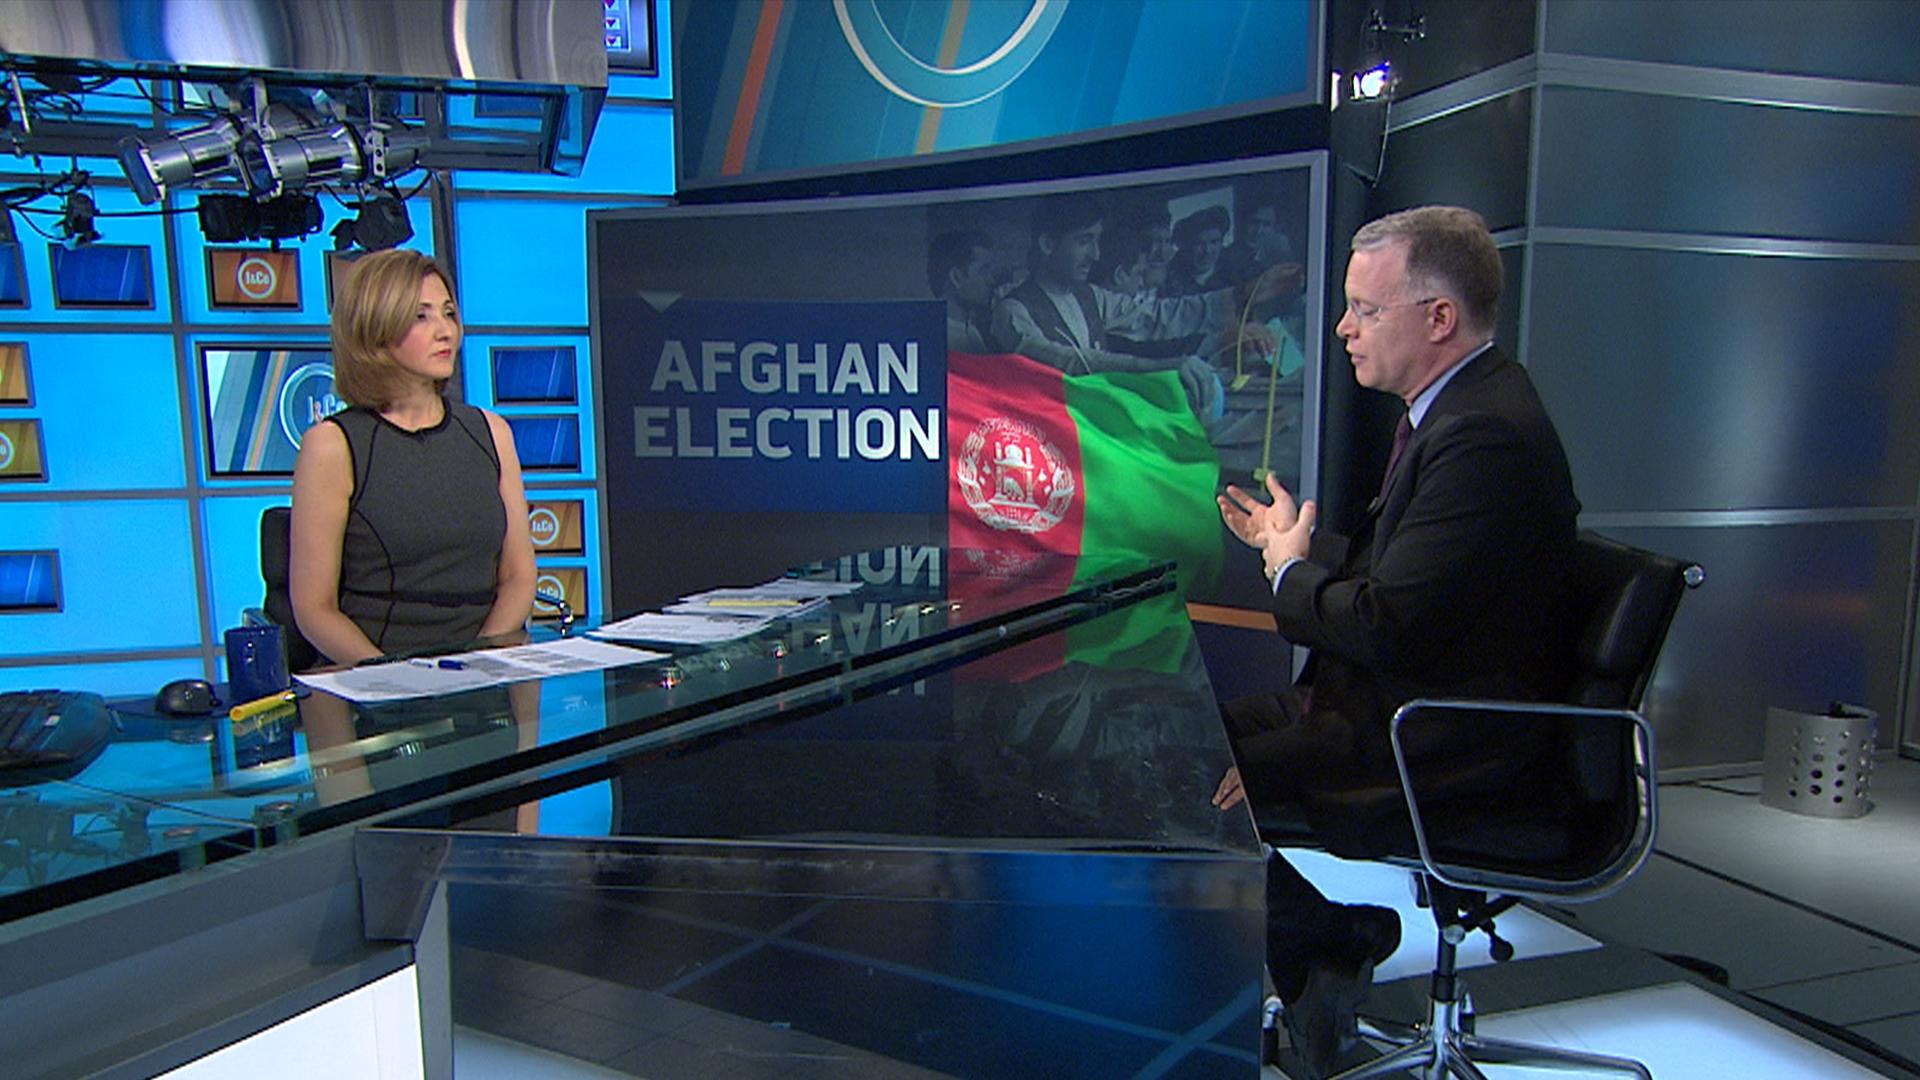 Milestone elections in Afghanistan